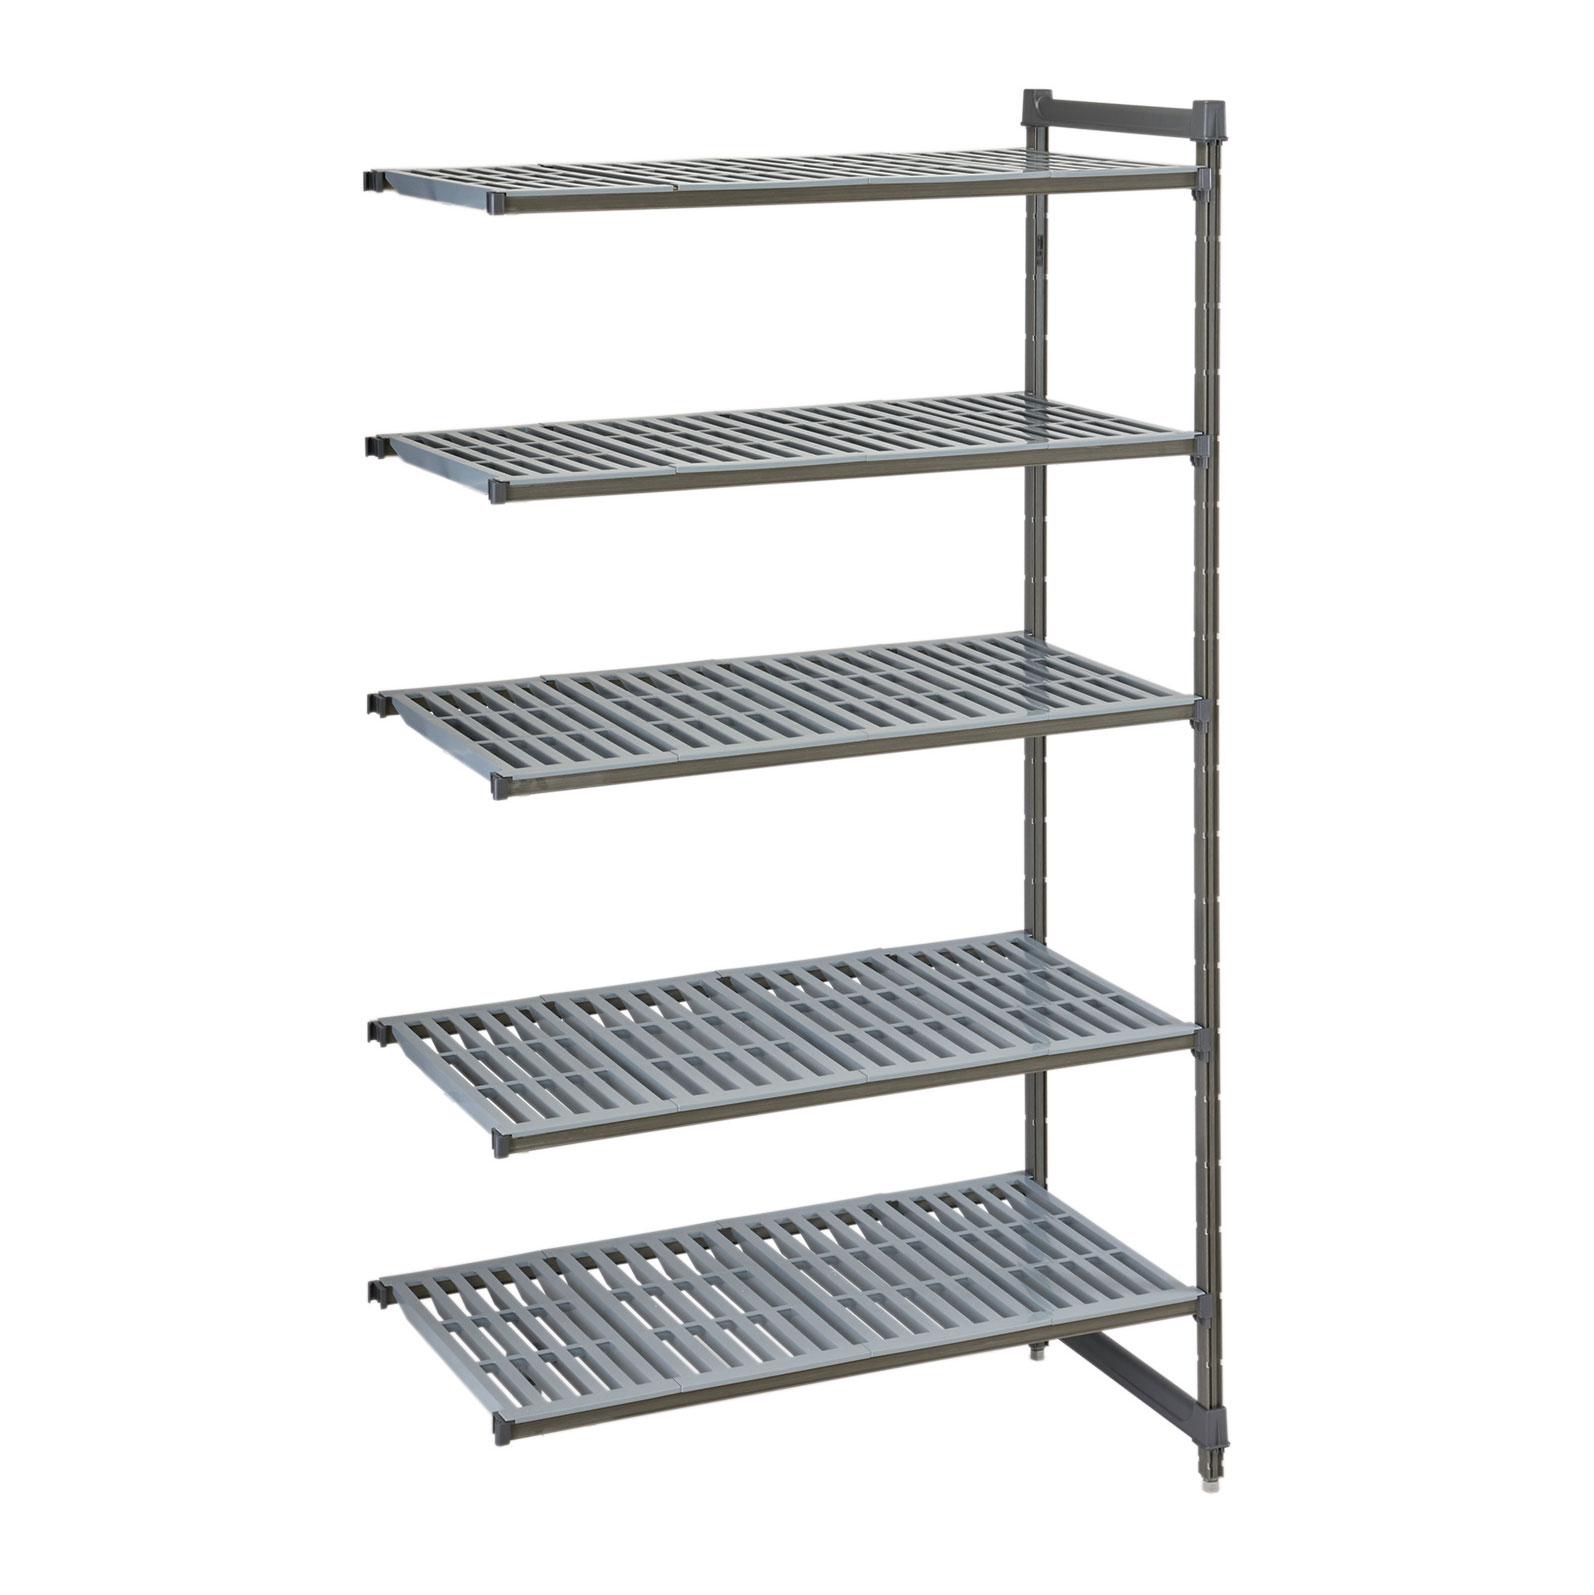 Cambro CBA183084V5580 shelving/shelving systems